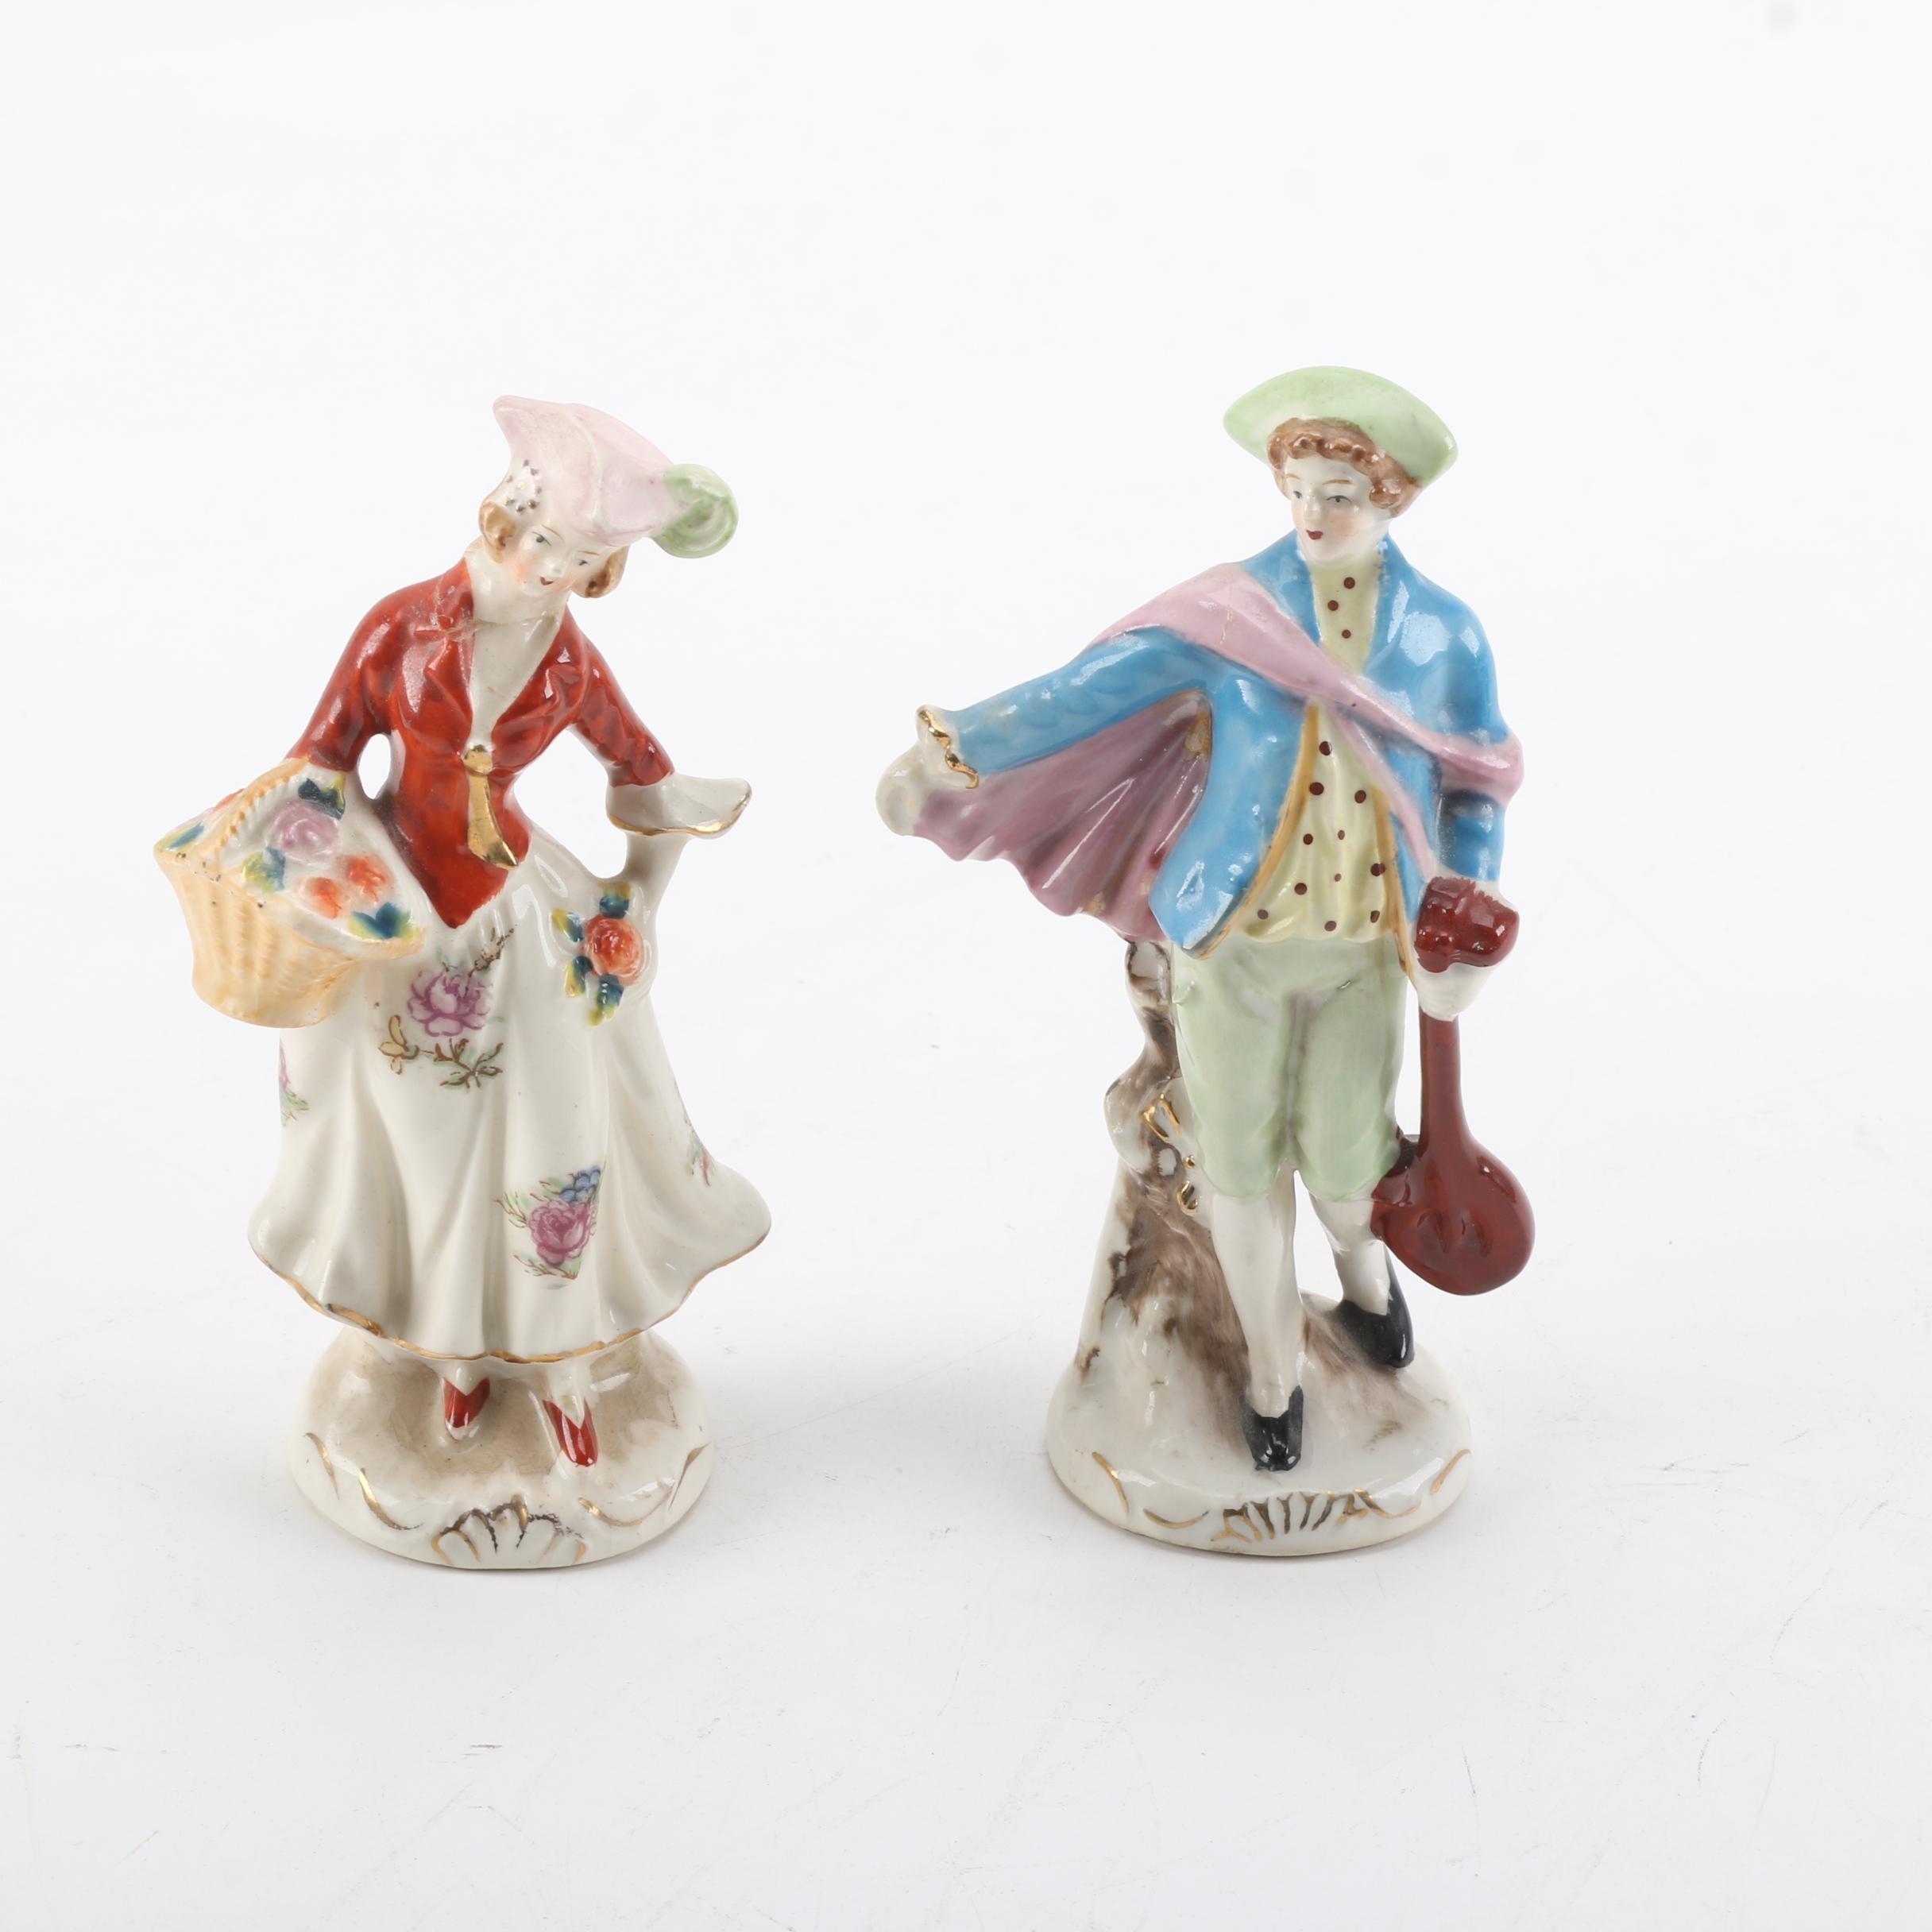 Vintage Porcelain Figurines Made in Occupied Japan